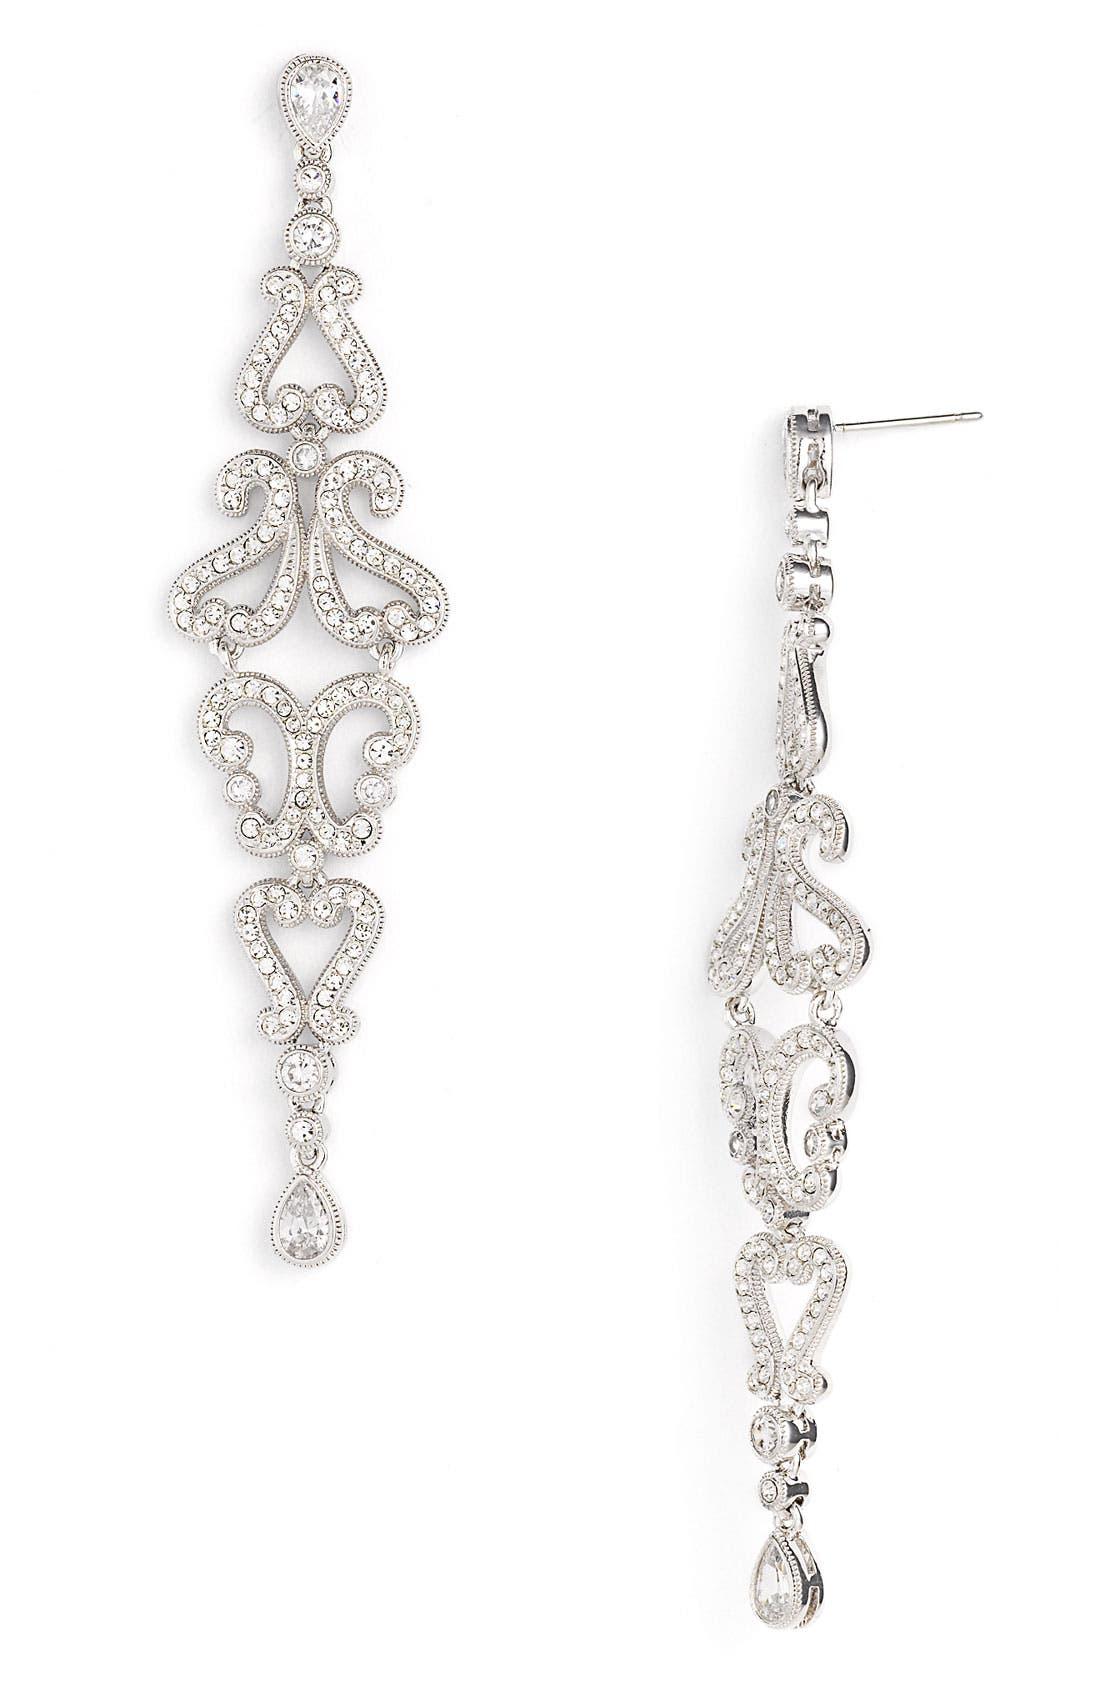 Main Image - Nadri Linear Filigree Earrings (Nordstrom Exclusive)